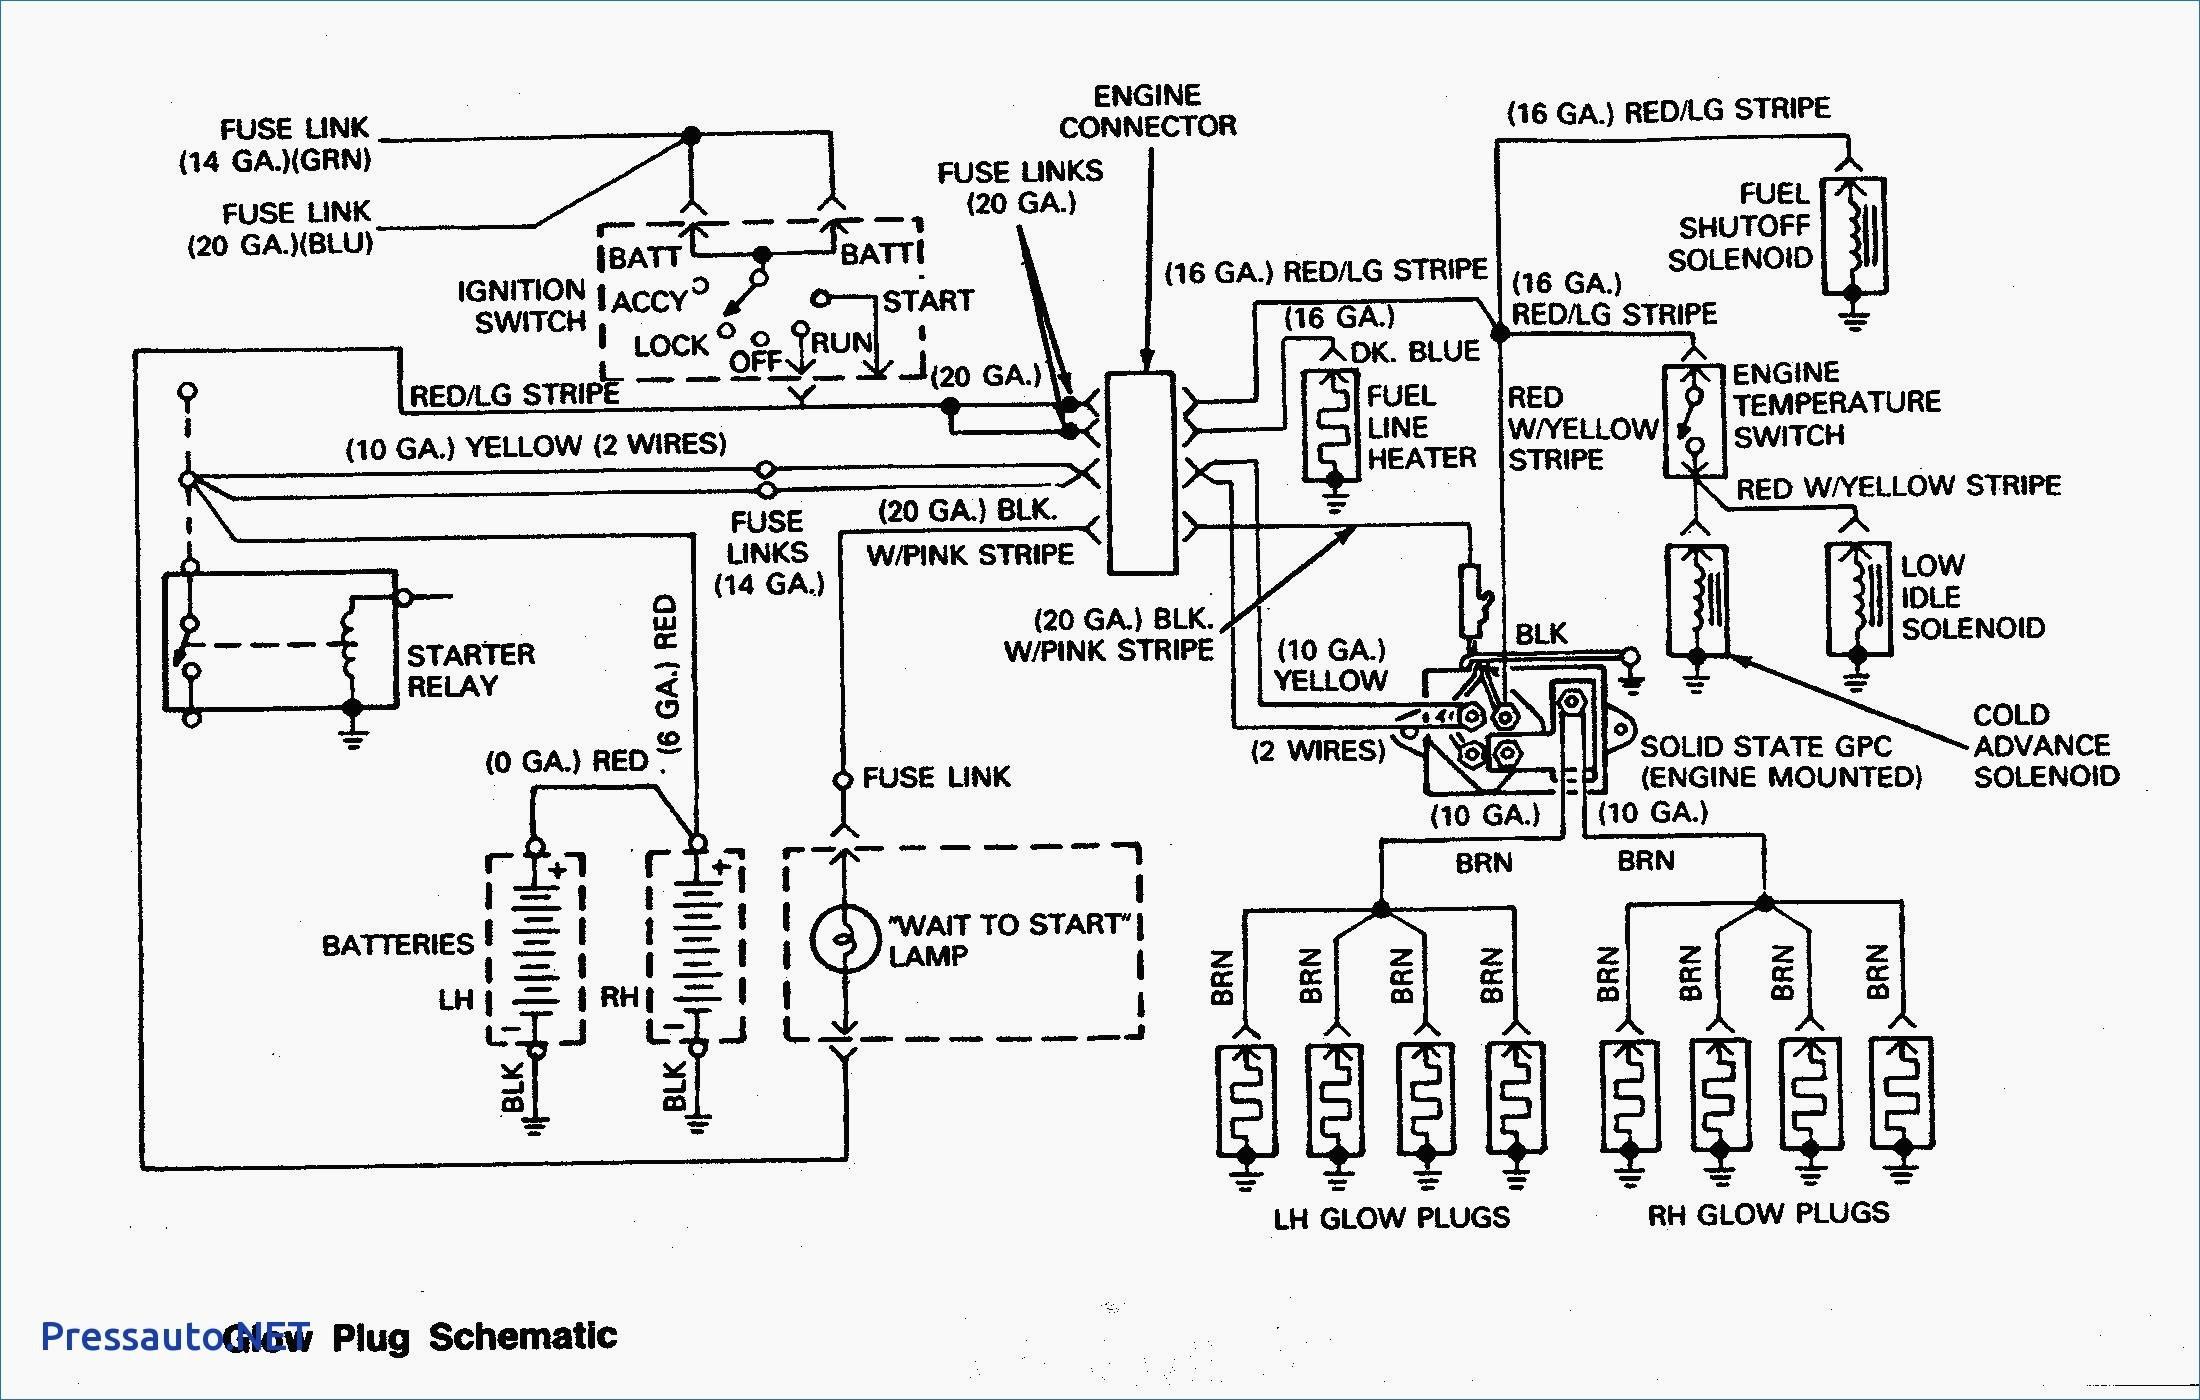 7.3 Glow Plug Relay Diagram Kr 7628] ford 7 3 Glow Plug Relay Wiring Diagram Moreover 7 Of 7.3 Glow Plug Relay Diagram